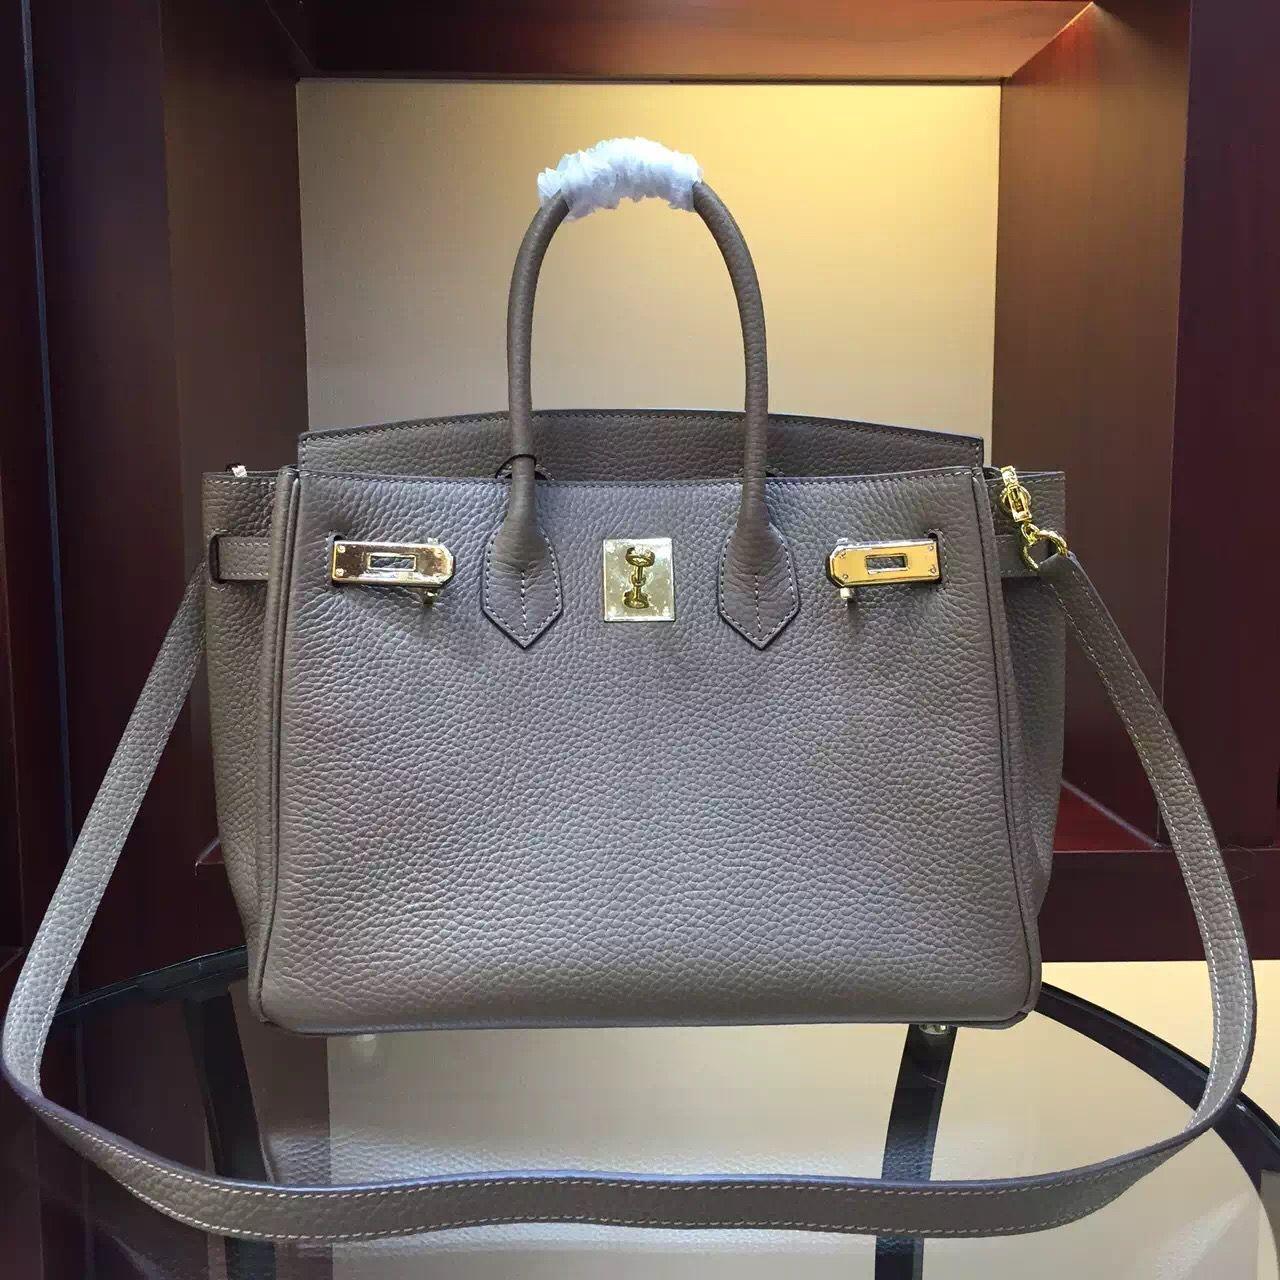 Hermes Togo Clafksin Birkin 30 Bag with Strap in Dark Grey(Gold Hardware) f33728b0c0